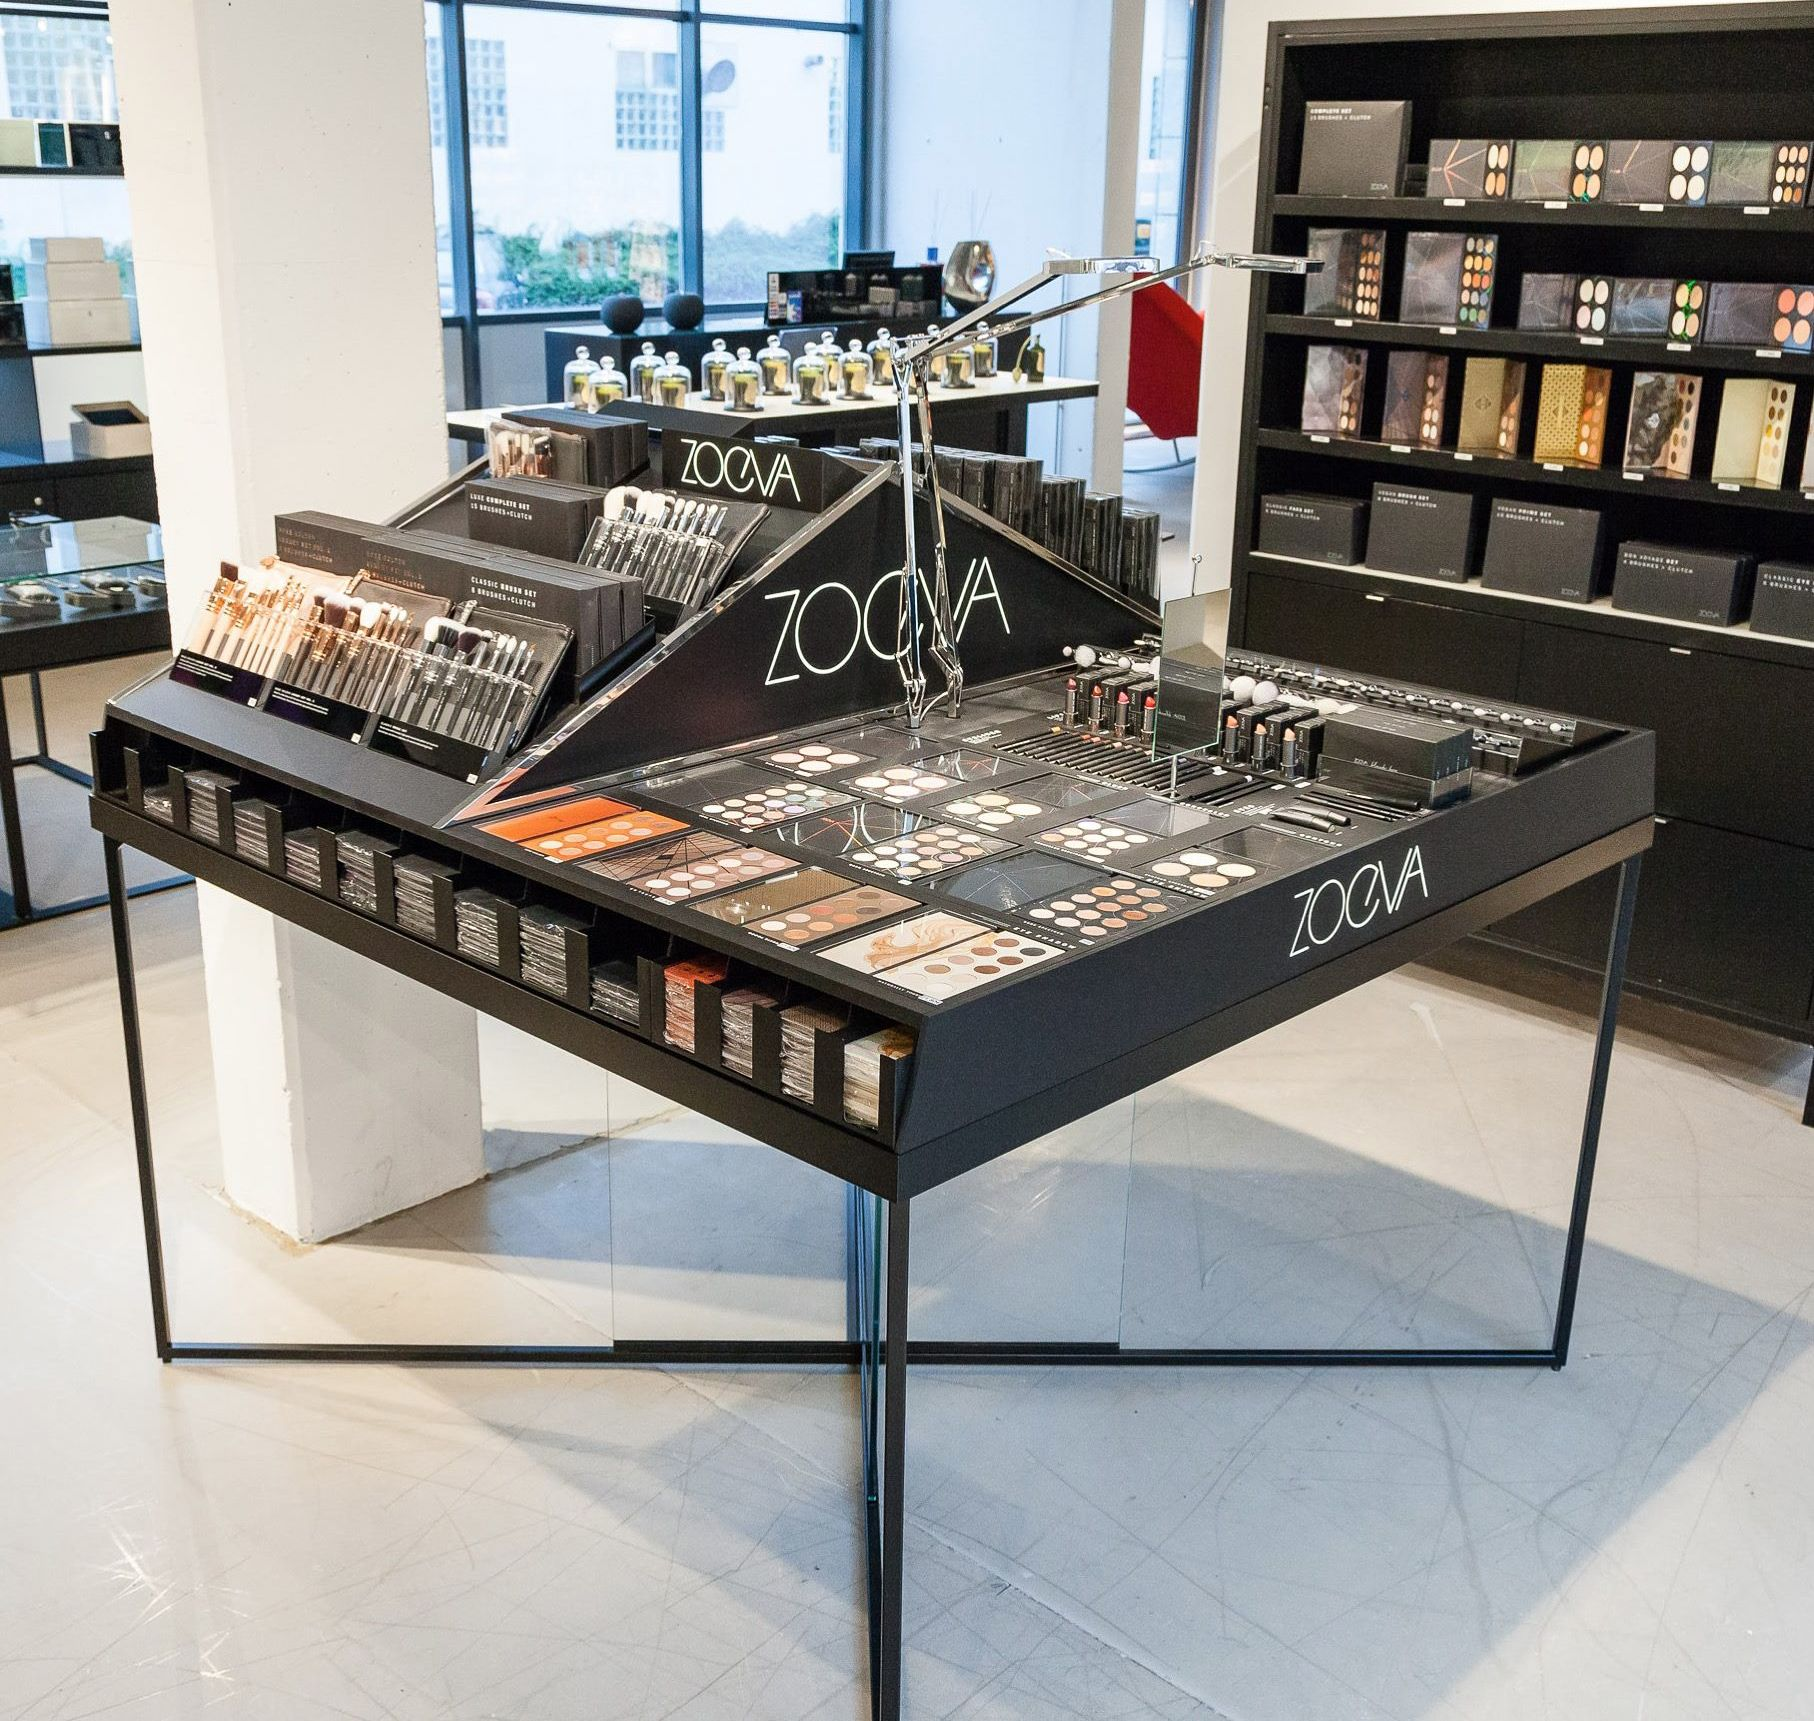 Makeup Table Creation For Zoeva Cosmetics Displayed In Selfridges, Douglas,